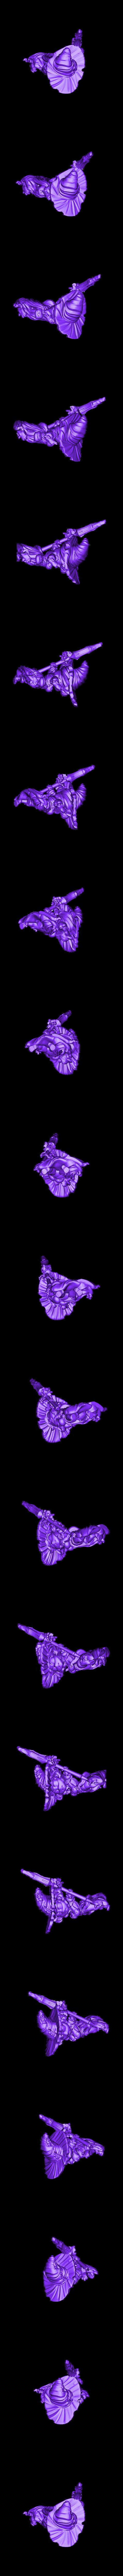 export.stl Download free STL file Kingdom Death Flower witch Chibi • 3D printing template, HeribertoValle